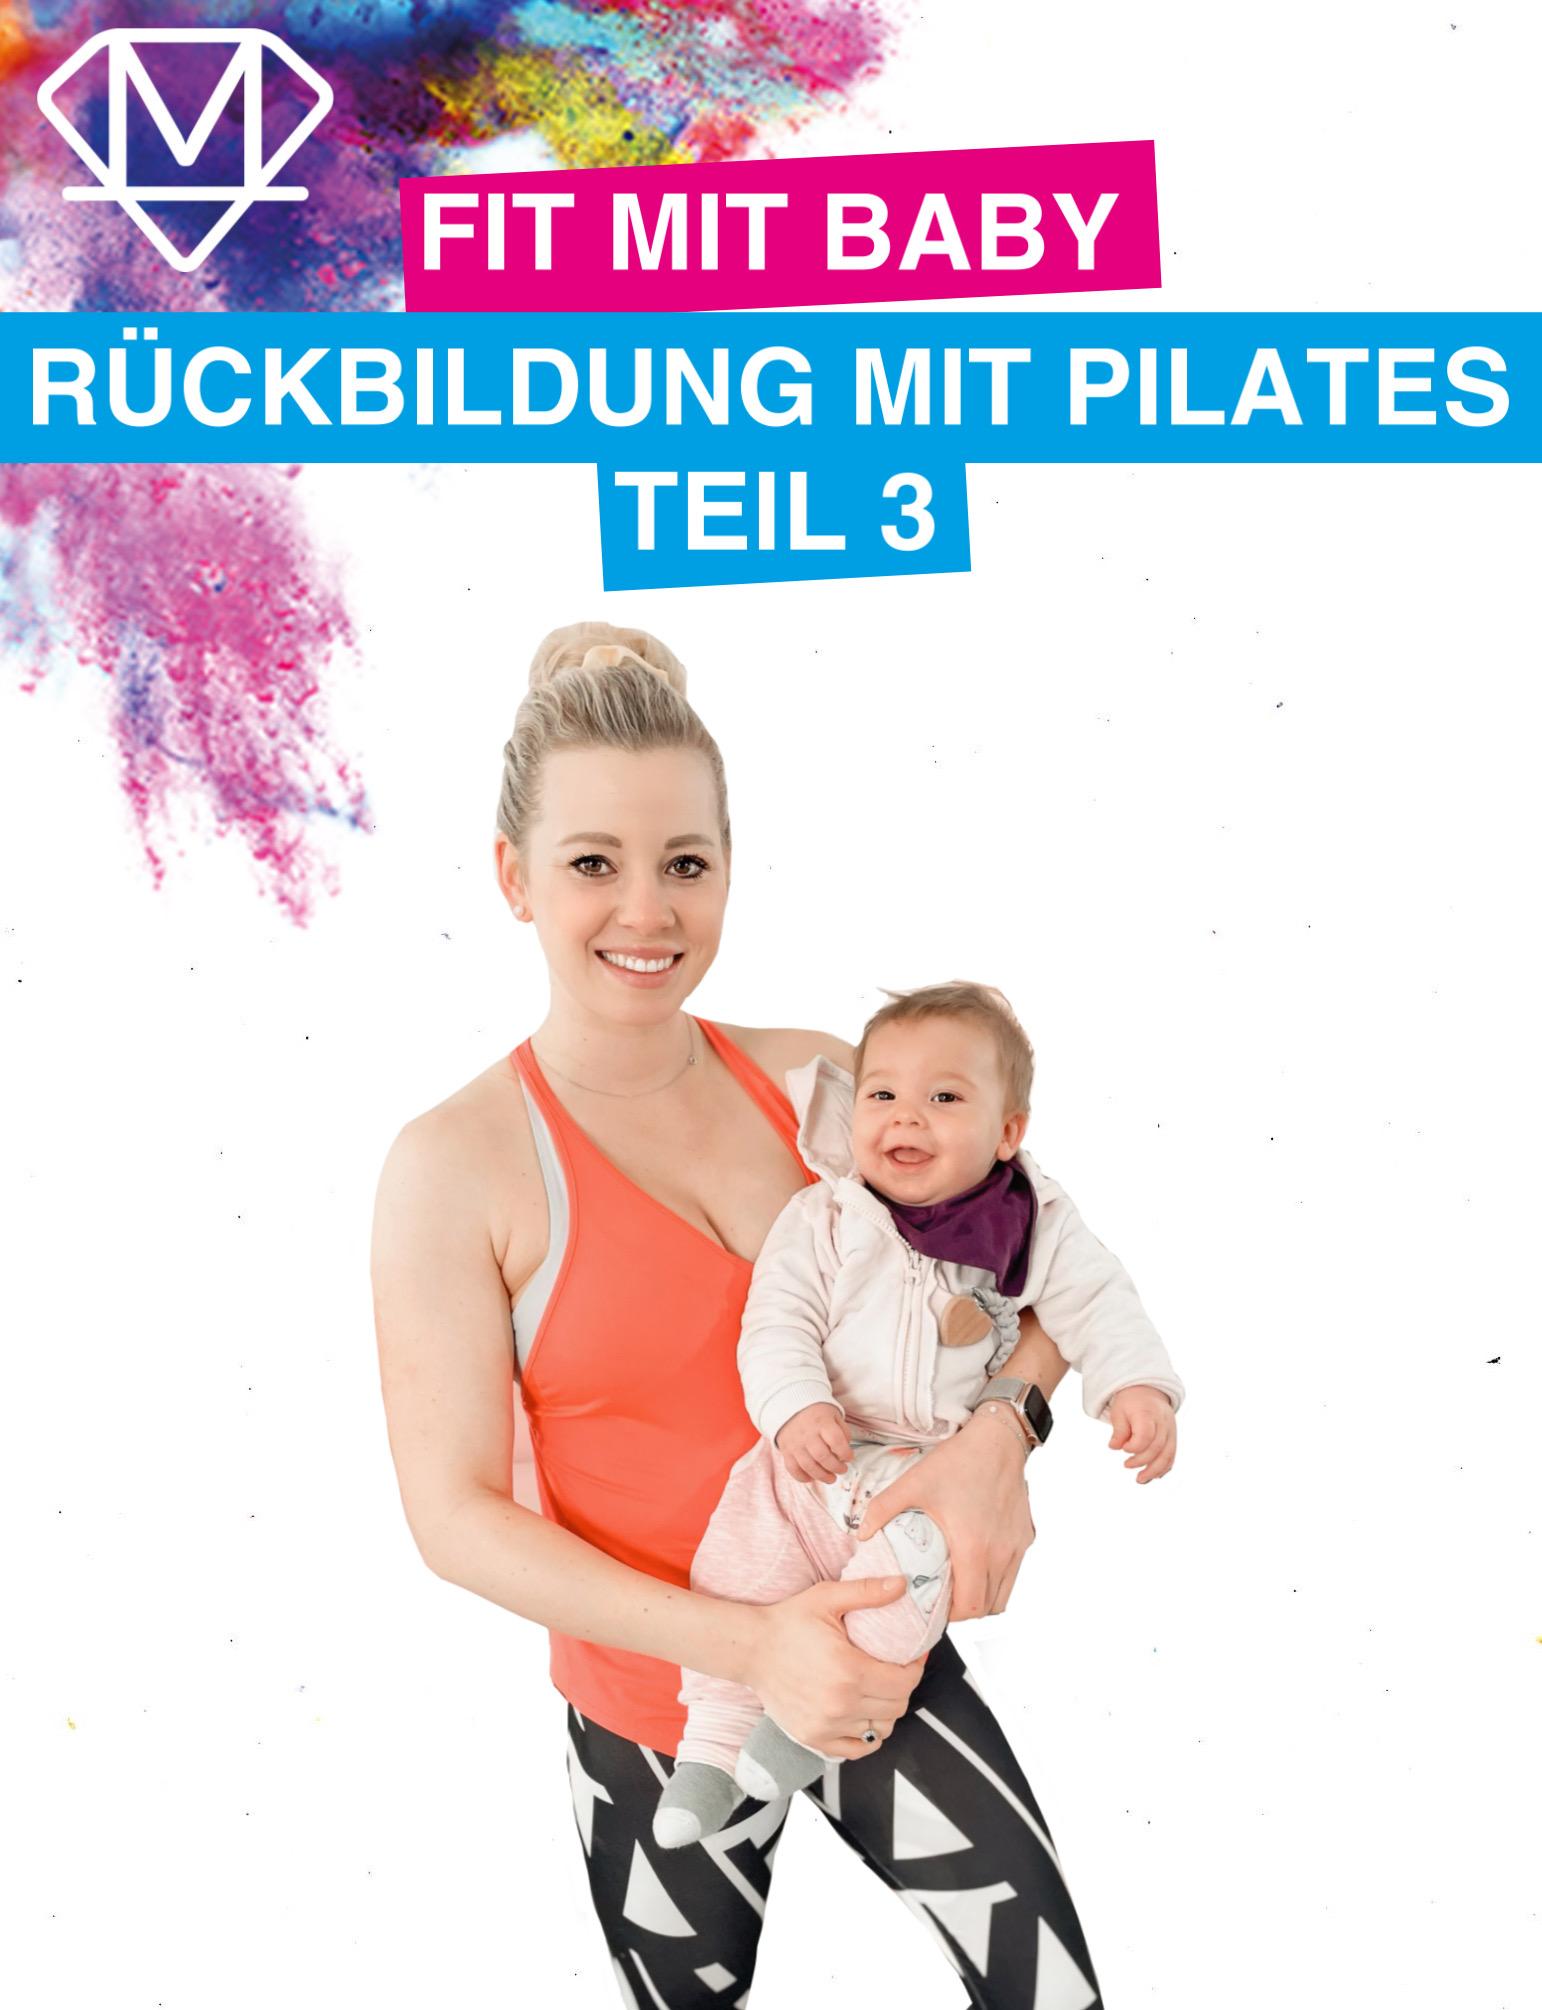 Fit mit Baby – Rückbildung mit Pilates – Teil 3